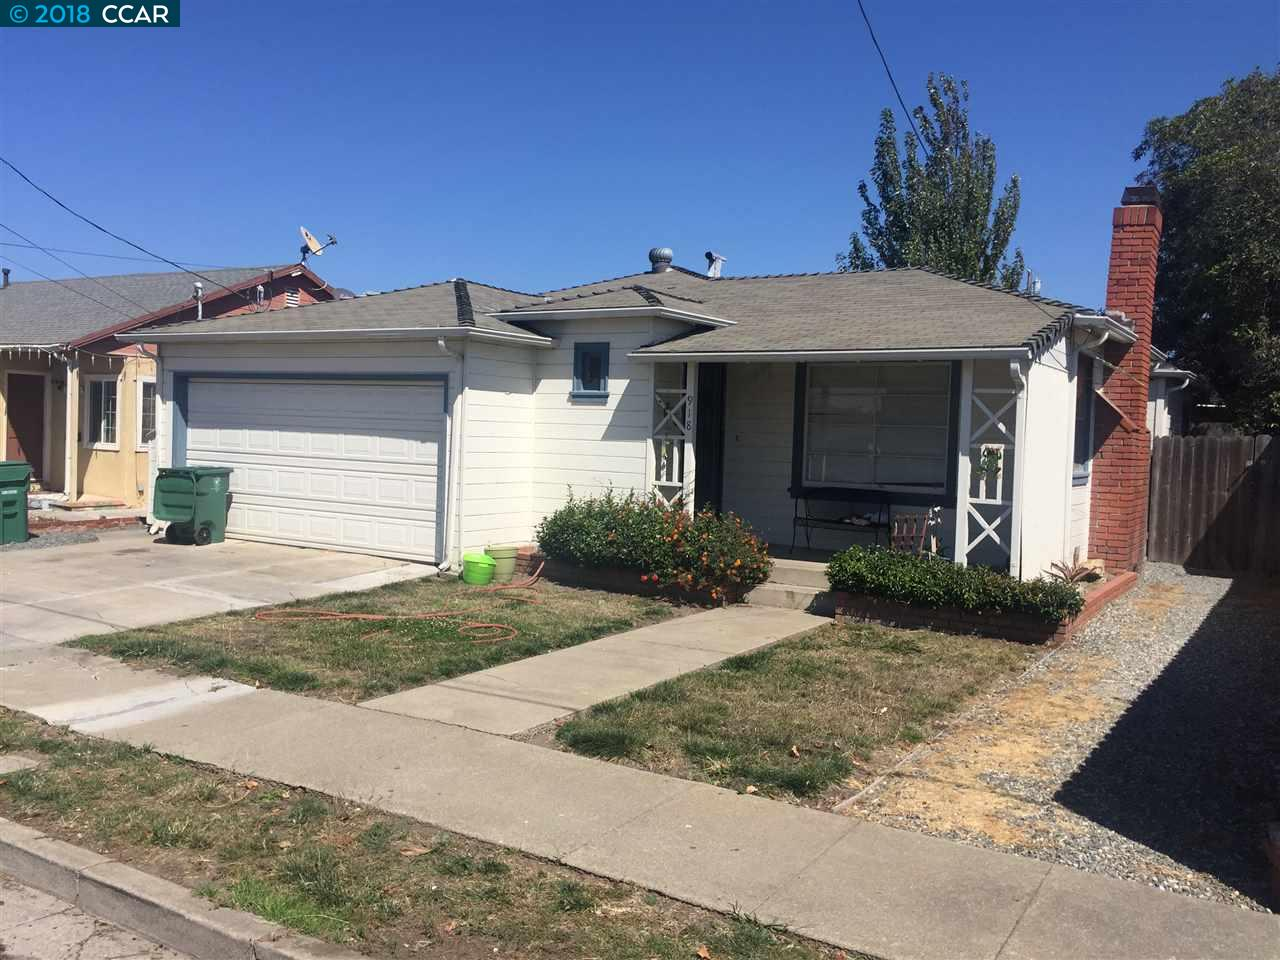 918 30TH ST, RICHMOND, CA 94804